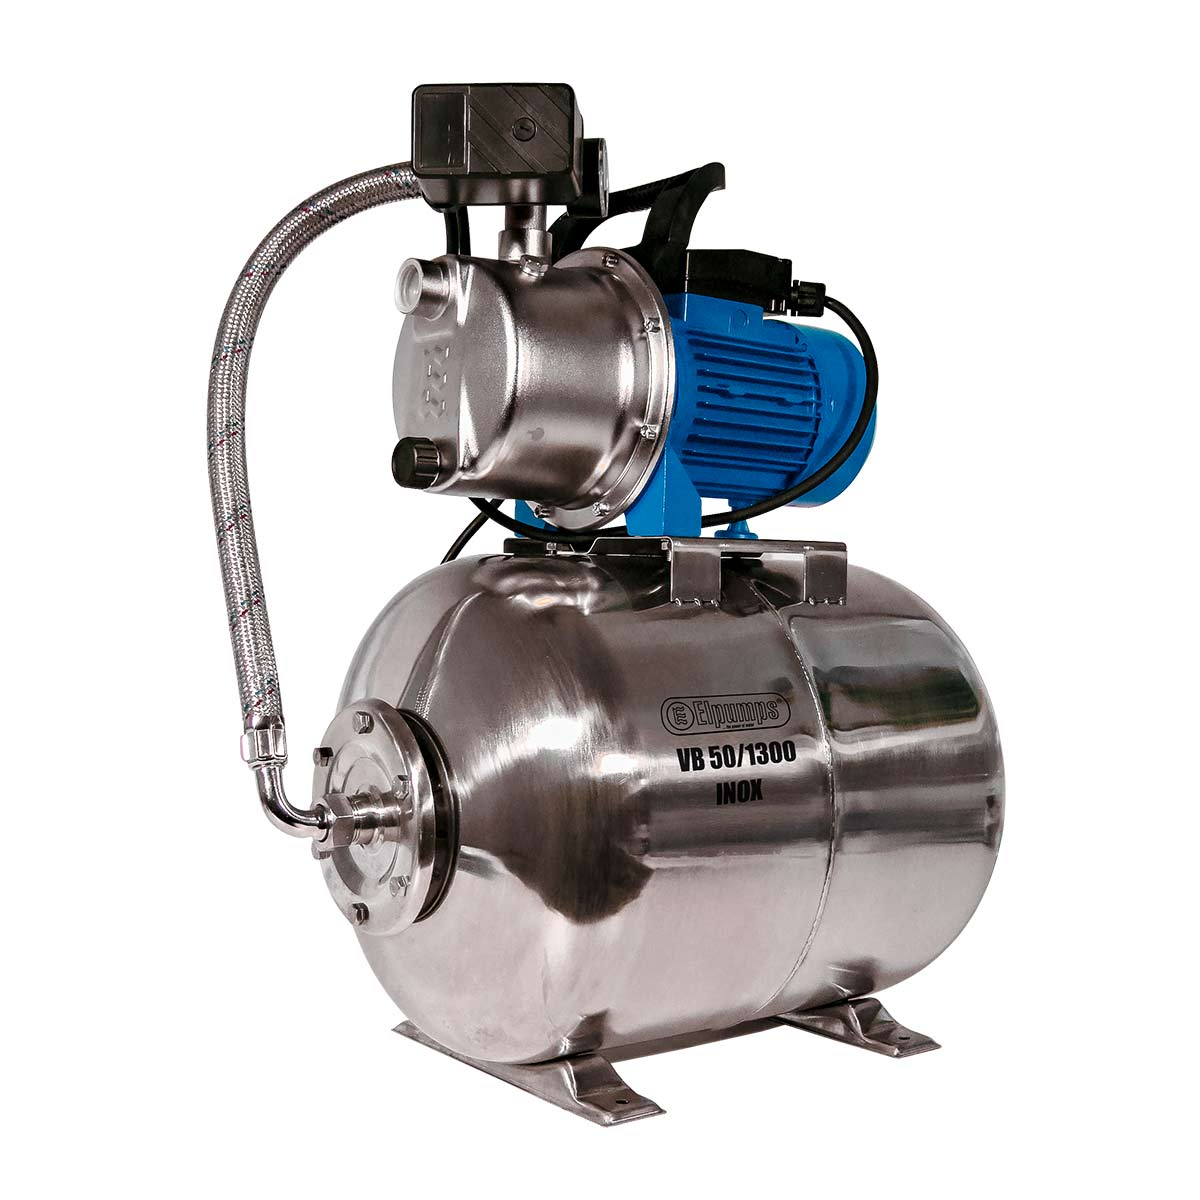 Hauswasserwerk VB 50/1300 INOX, H max 48.0 m, Q max 5400 l/h, 1.3 kW, 605 x 365 x 650 mm, 1' IG, 230 V